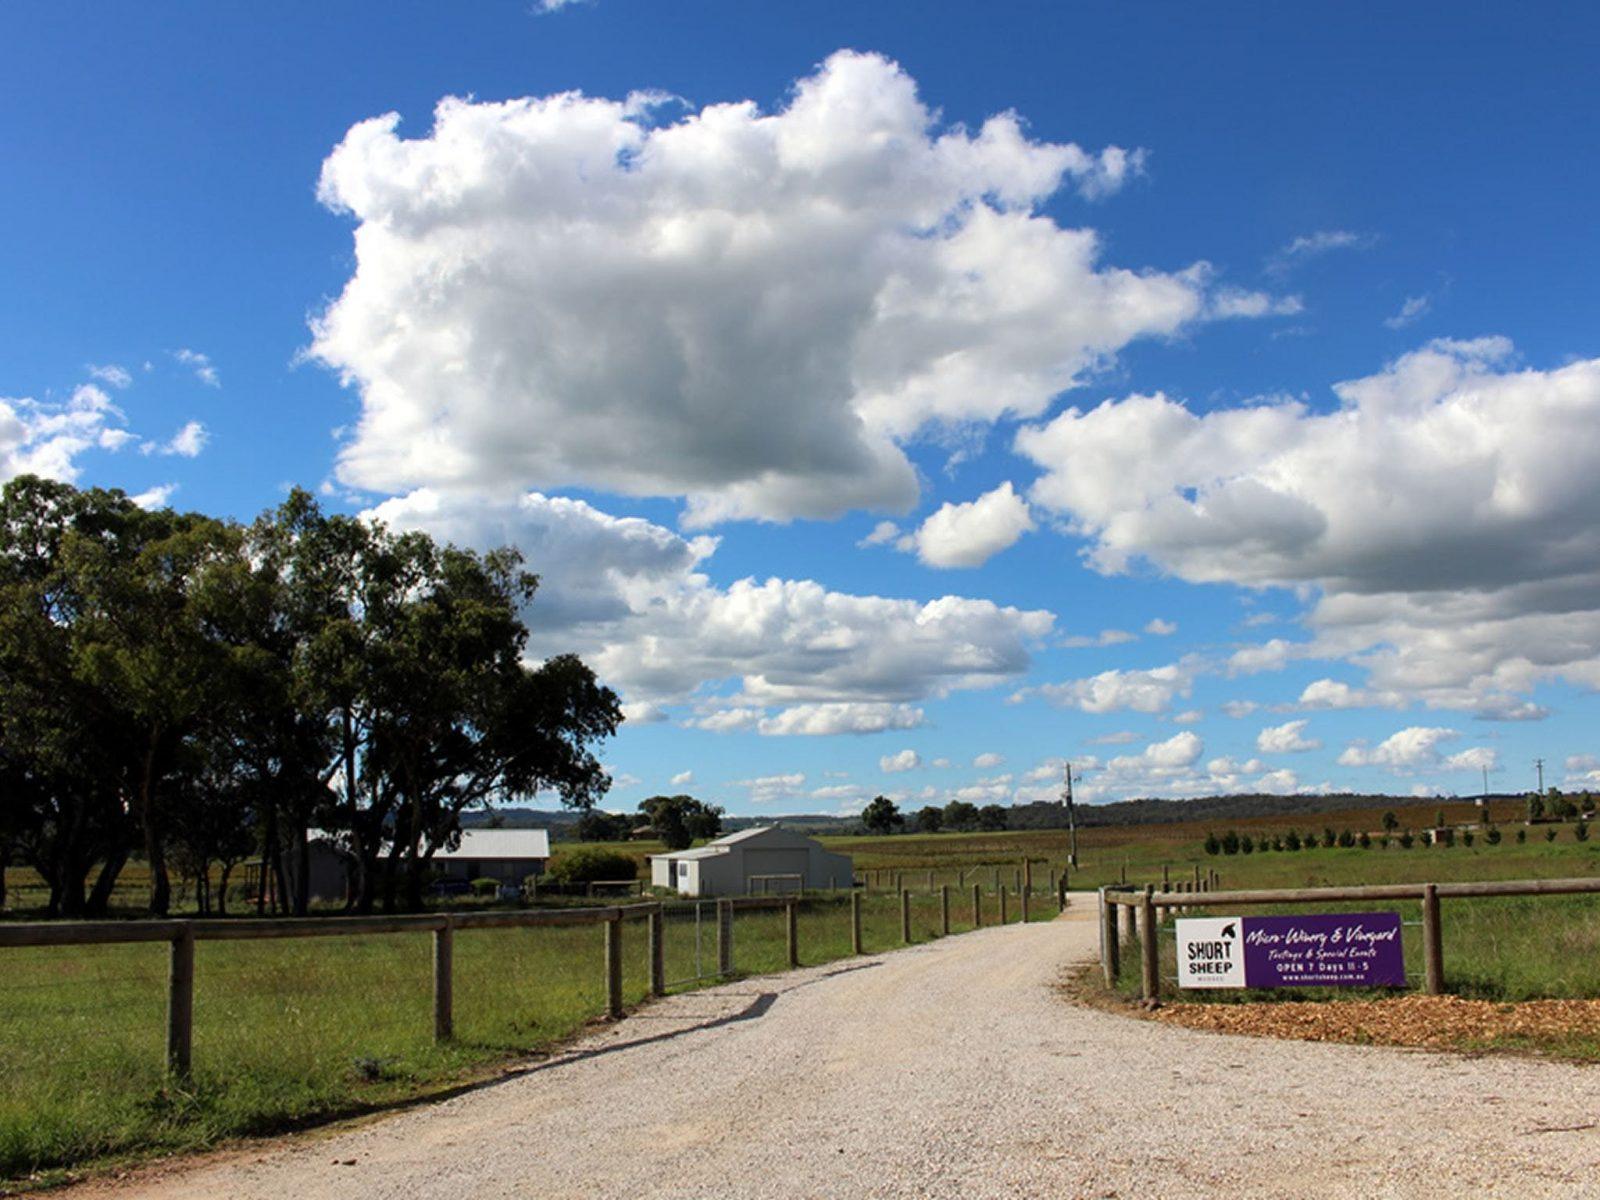 Entrance to SHORT SHEEP